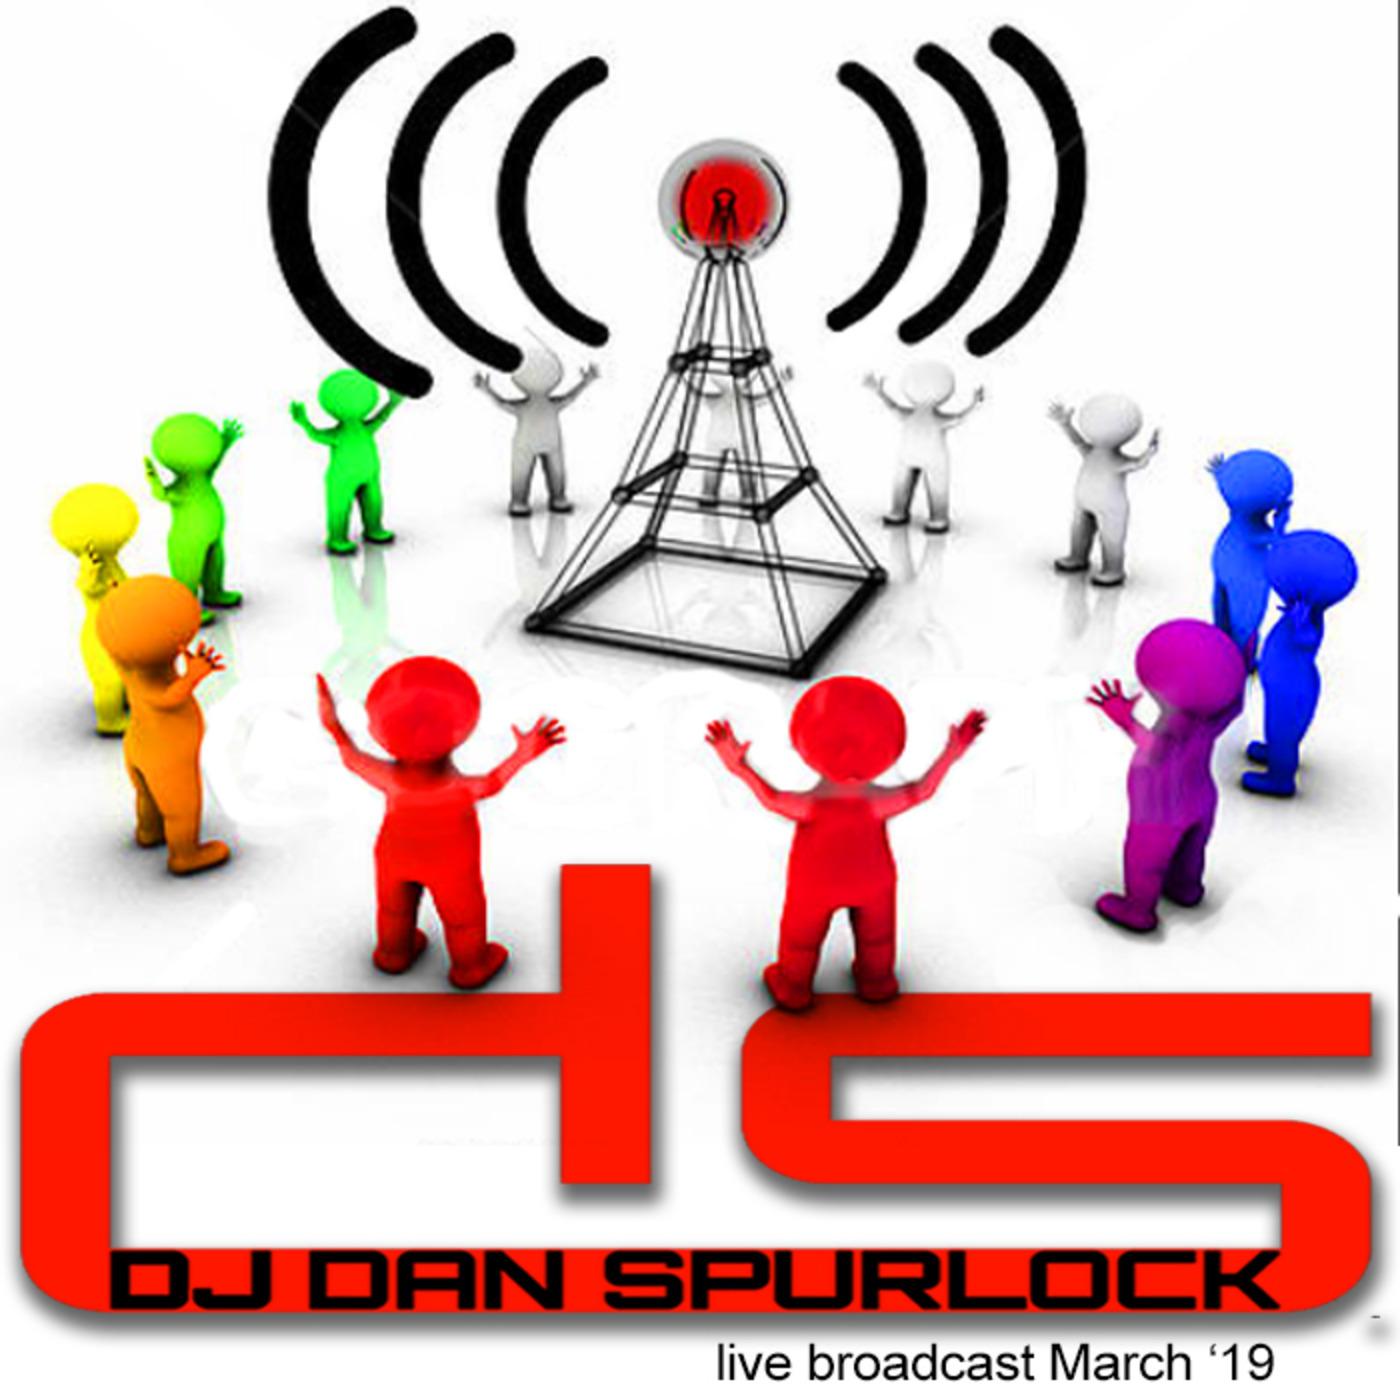 Live Stream March 2019 DJ Dan Spurlock podcast